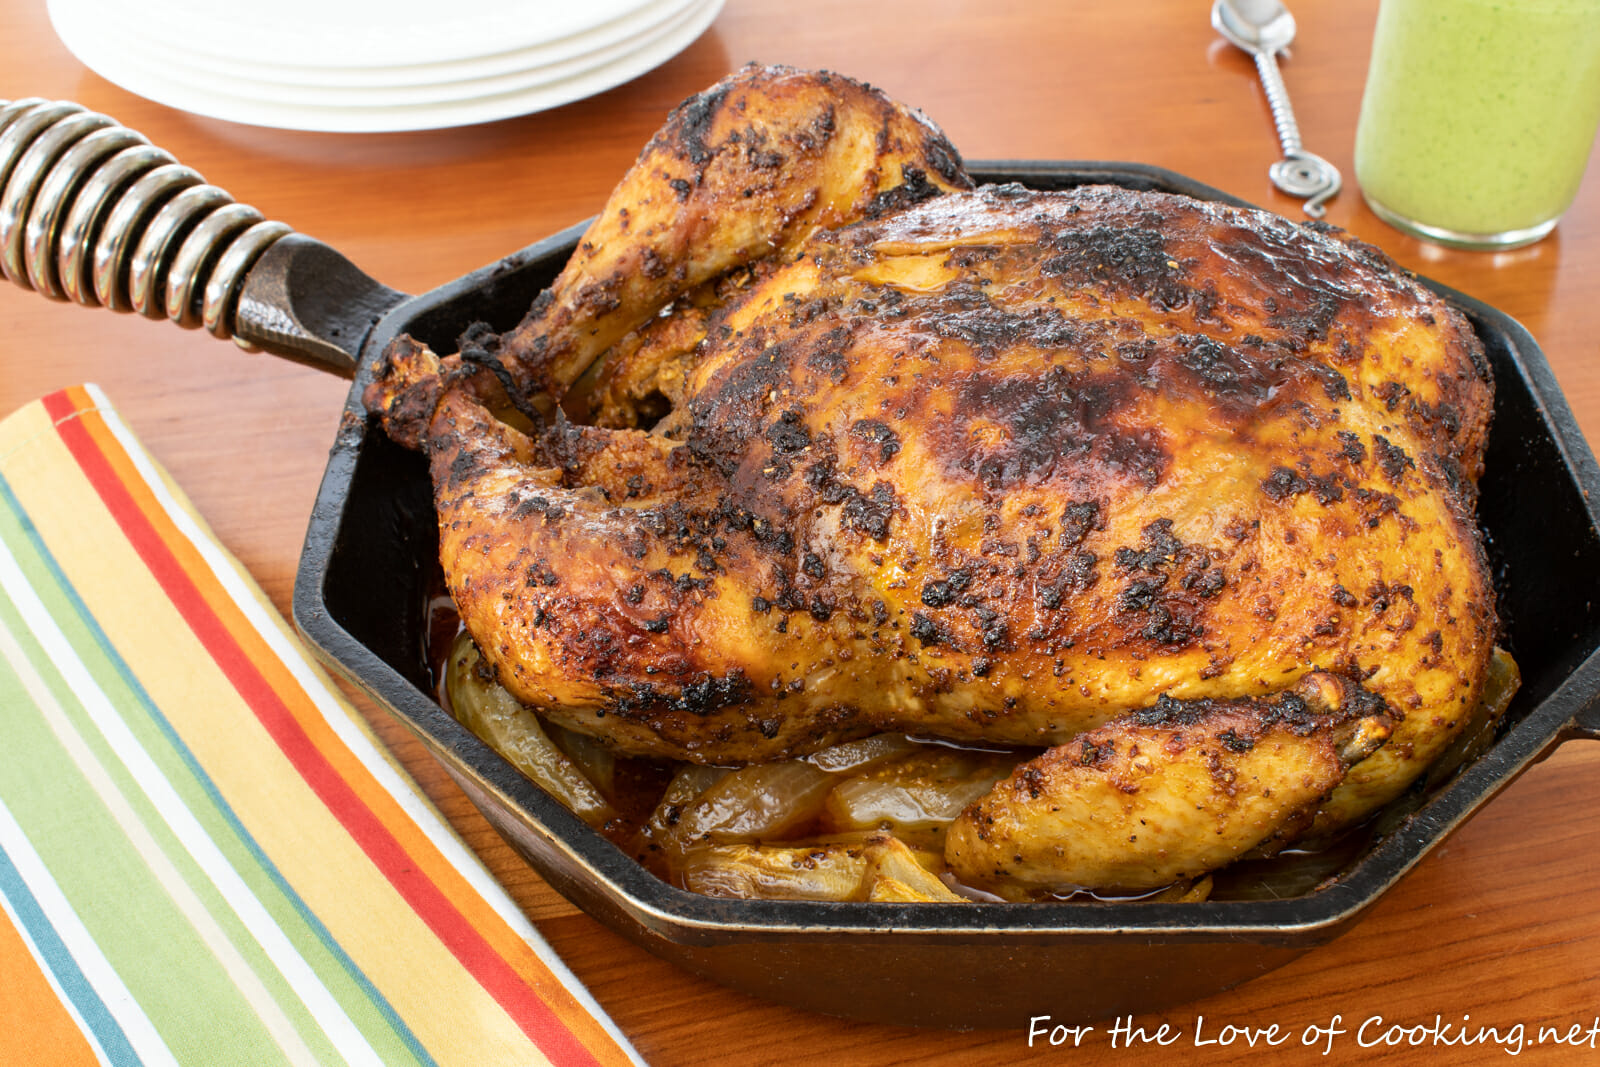 Peruvian-Style Roasted Chicken